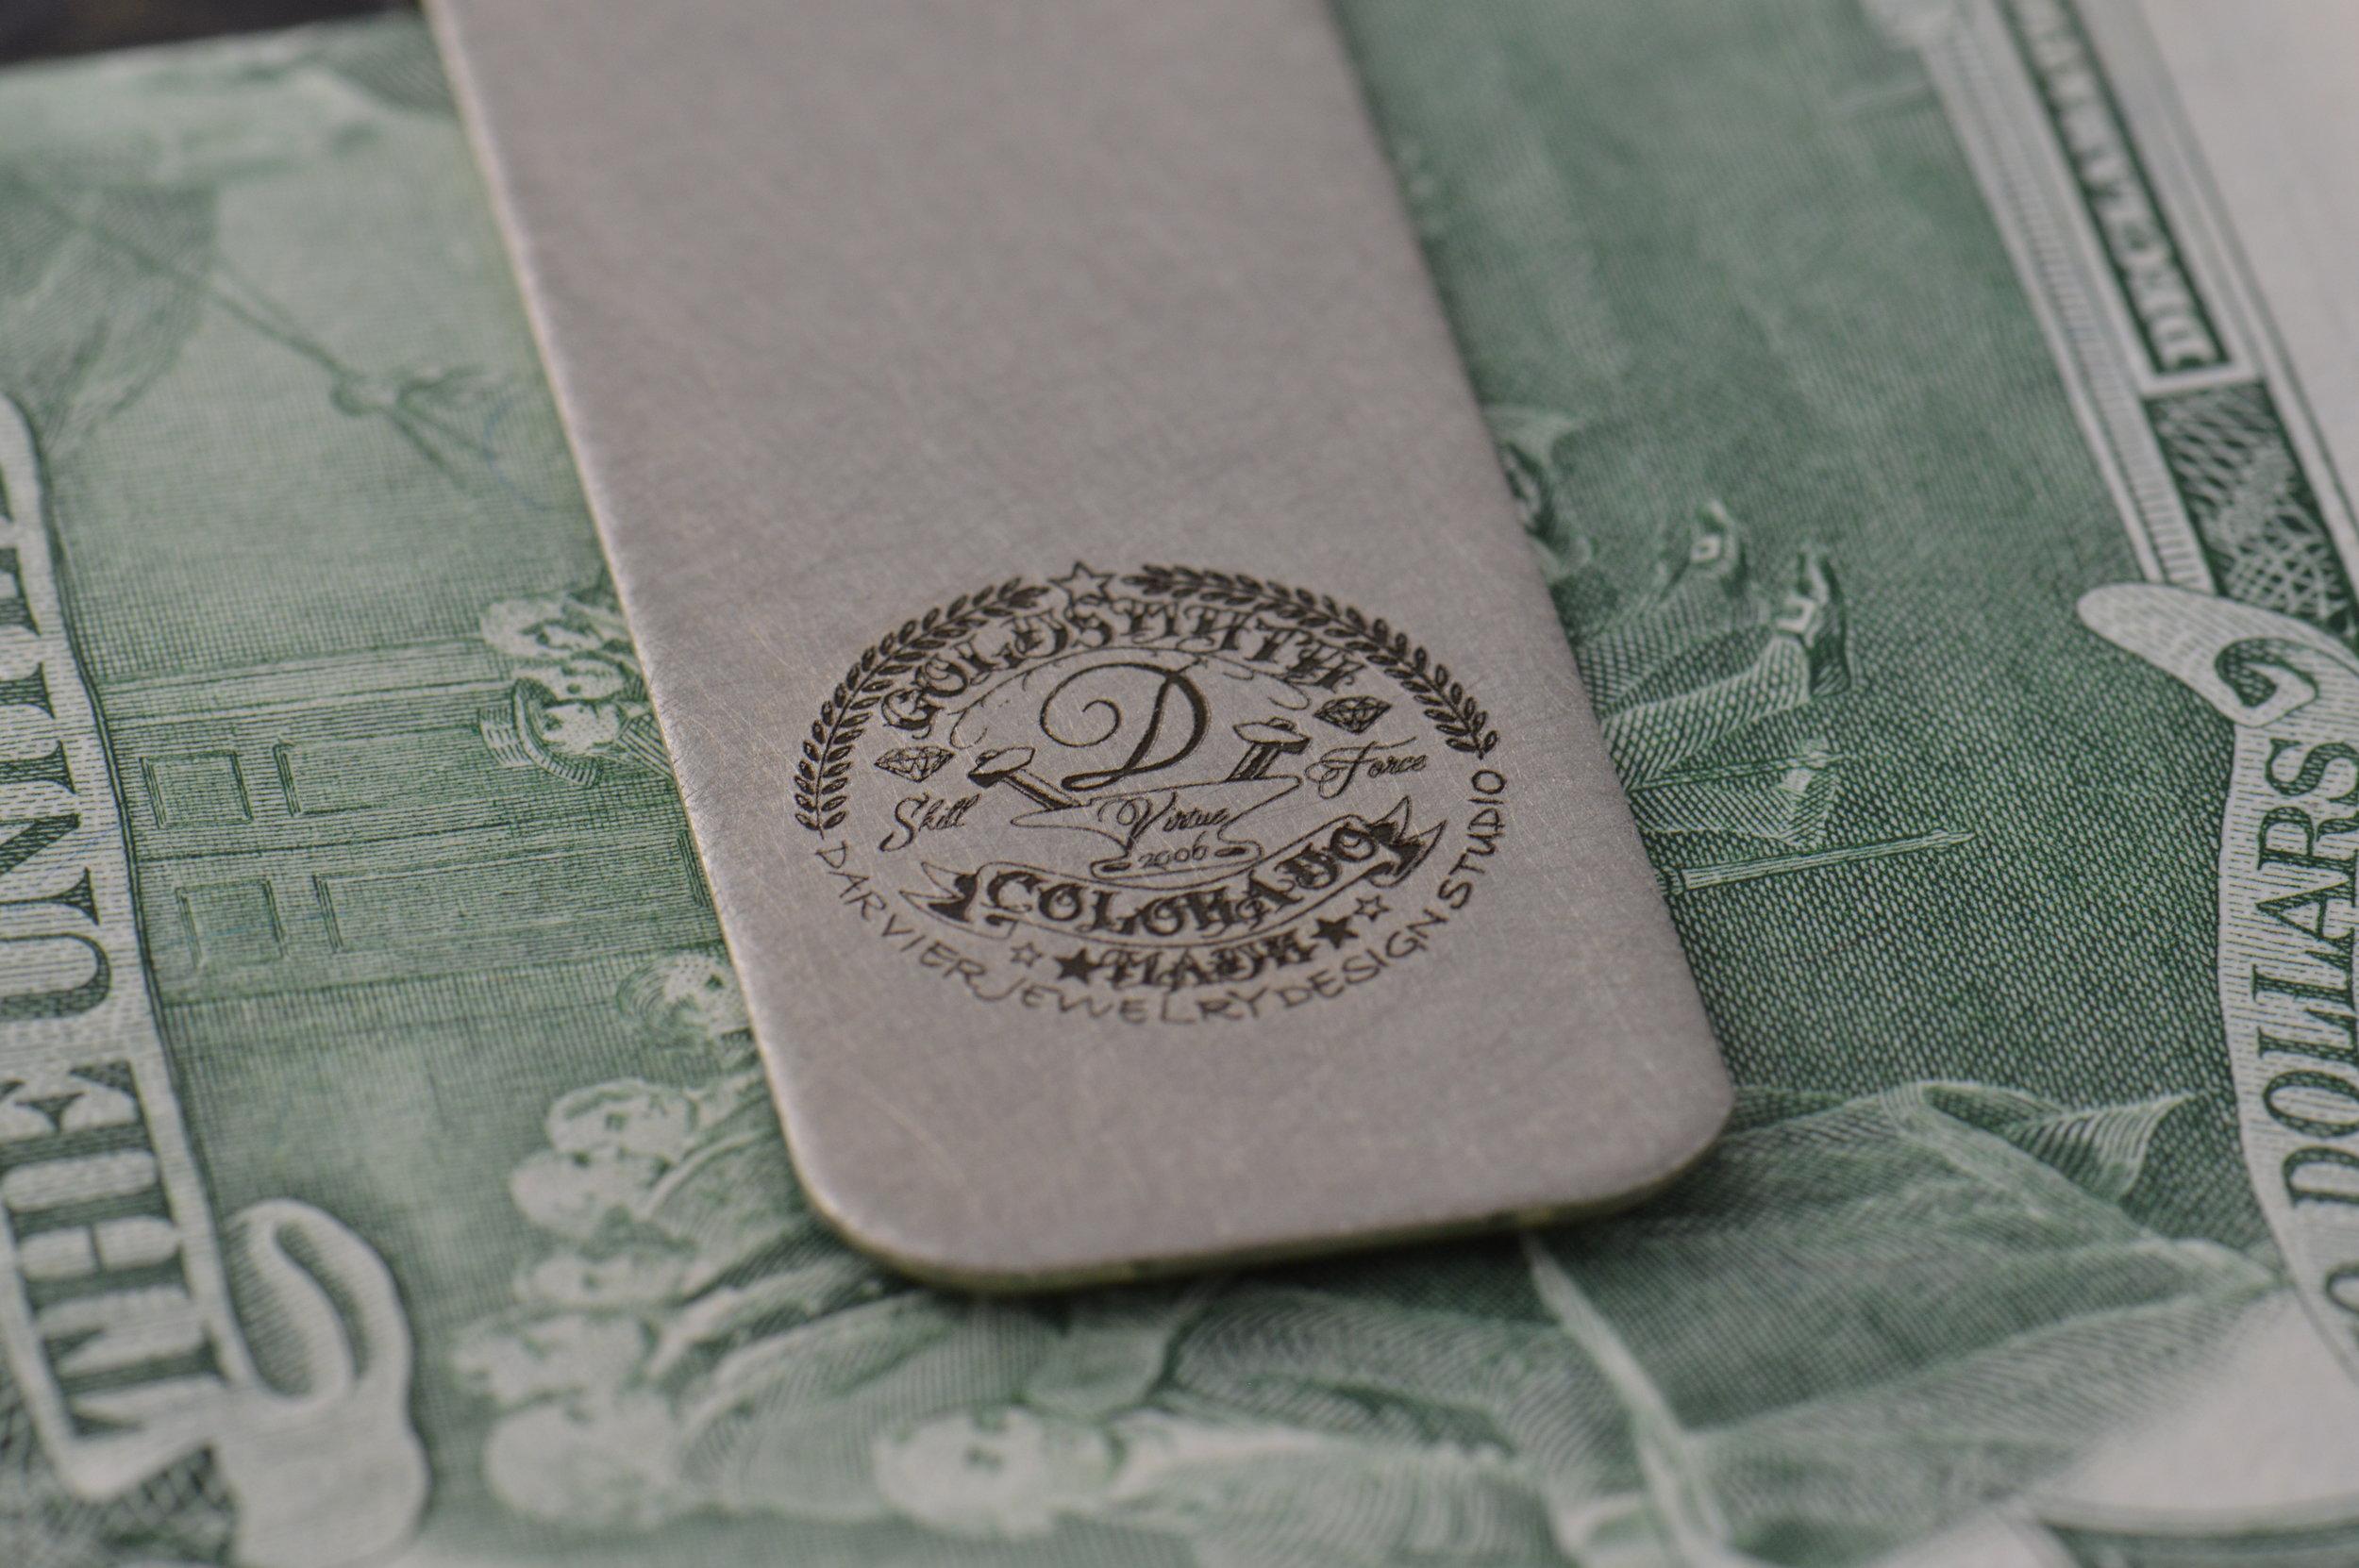 darvier-tattoo-logo-cash-money-two-bucks.JPG